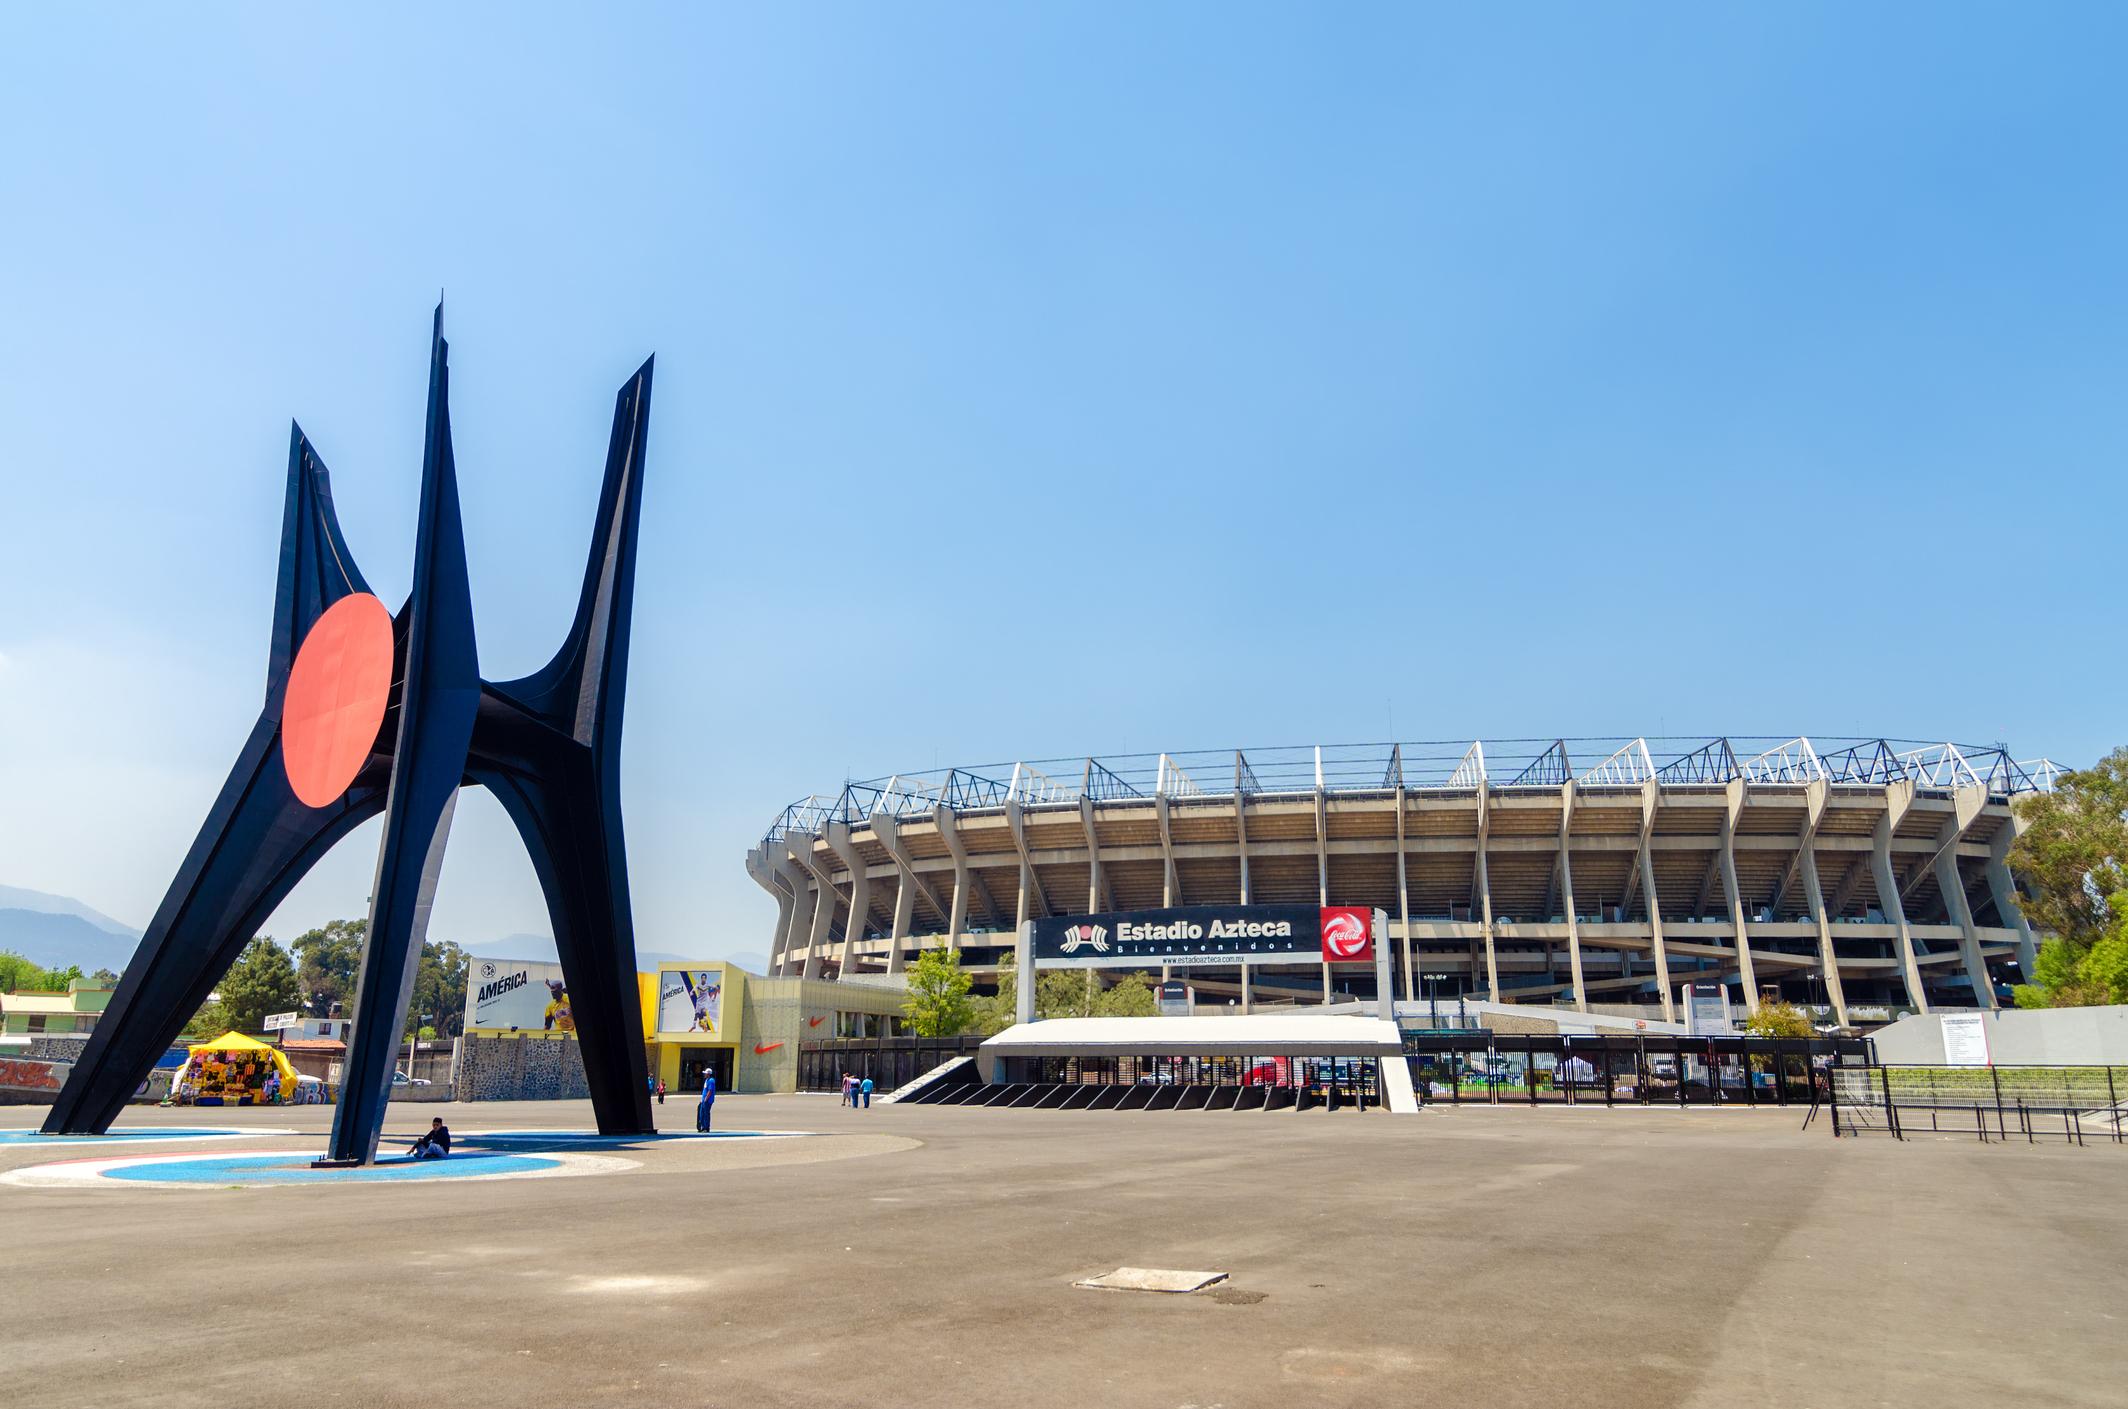 Azteca Stadium in Mexico City (Getty Images)